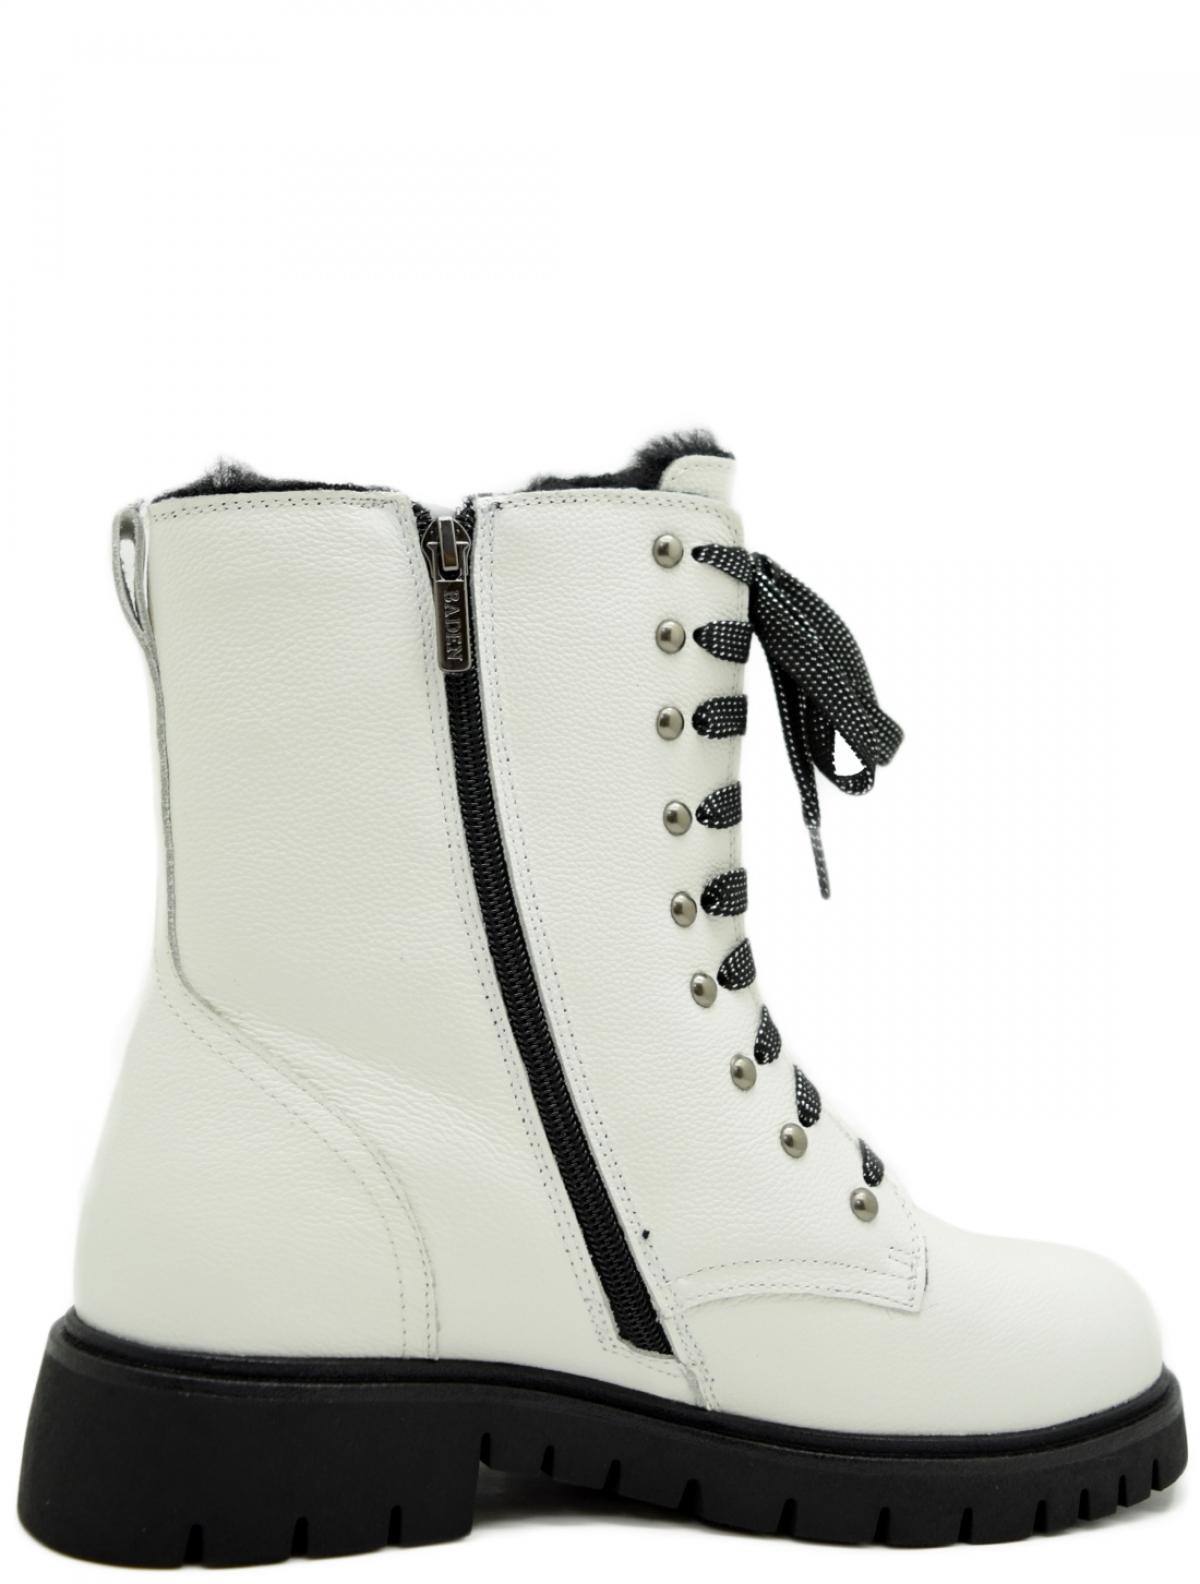 Baden P263-031 женские ботинки